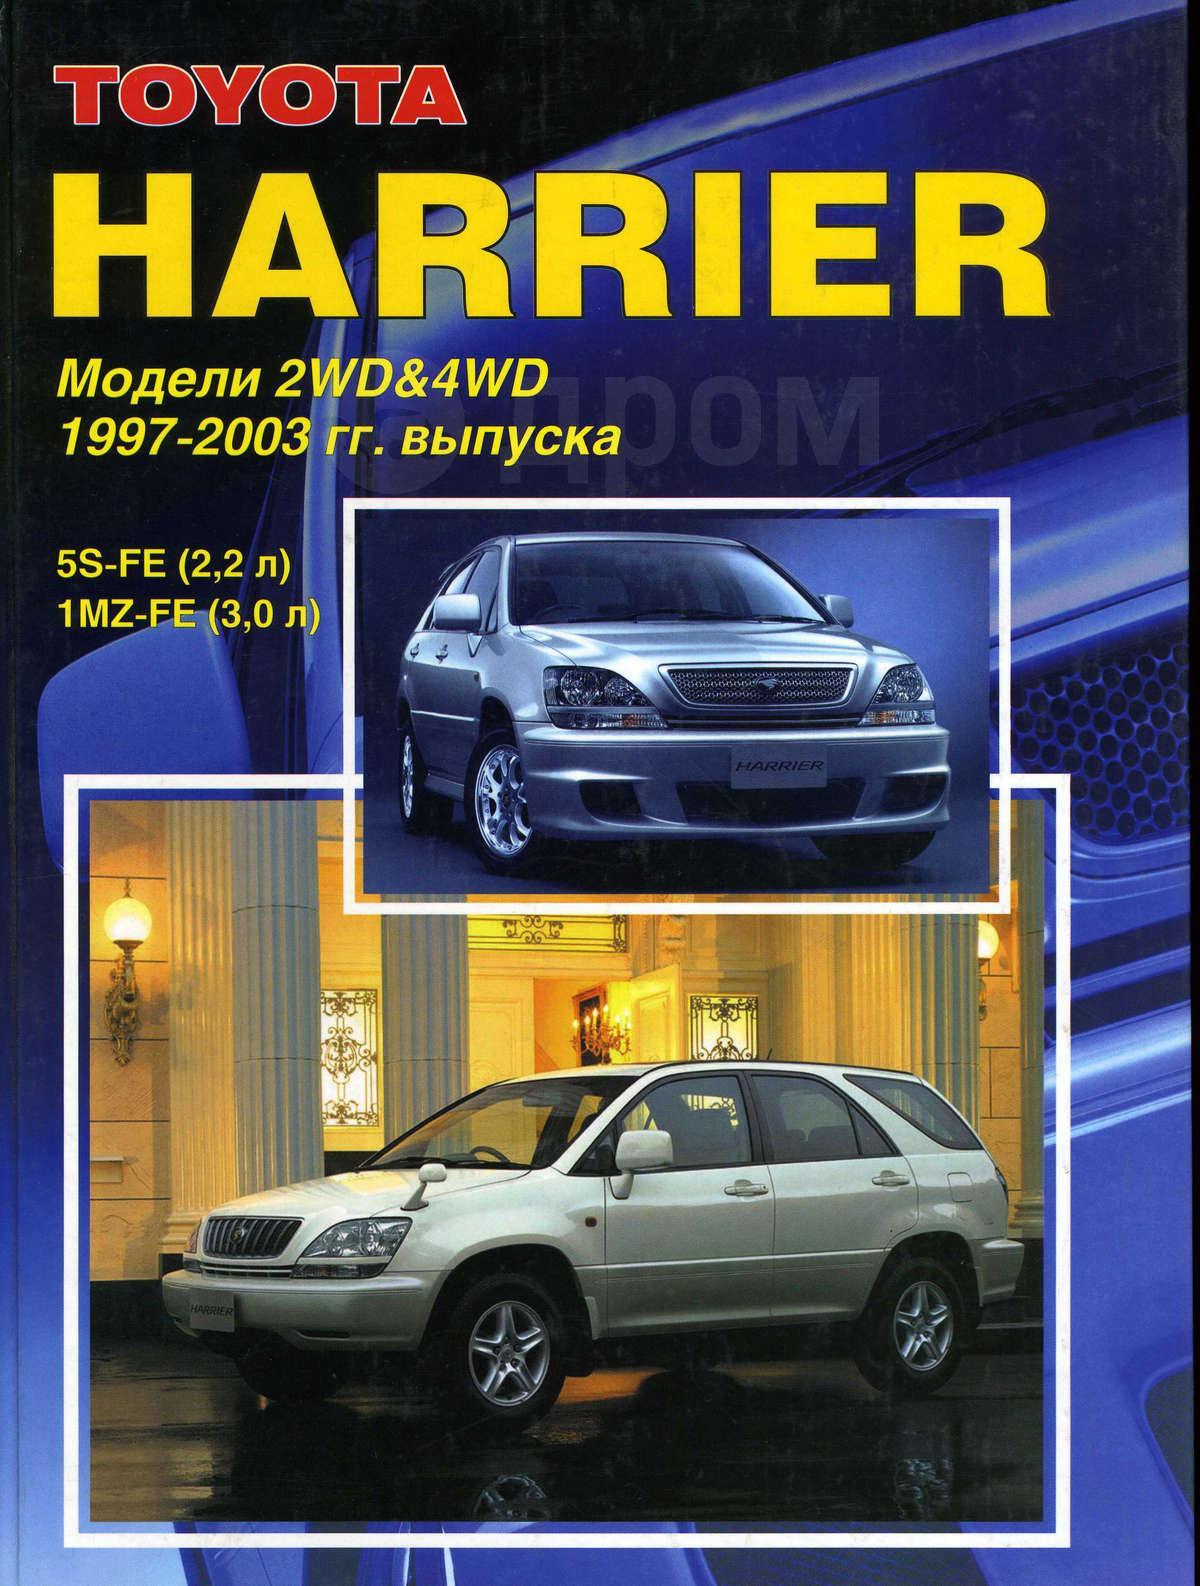 тойота харриер 2003 инструкция